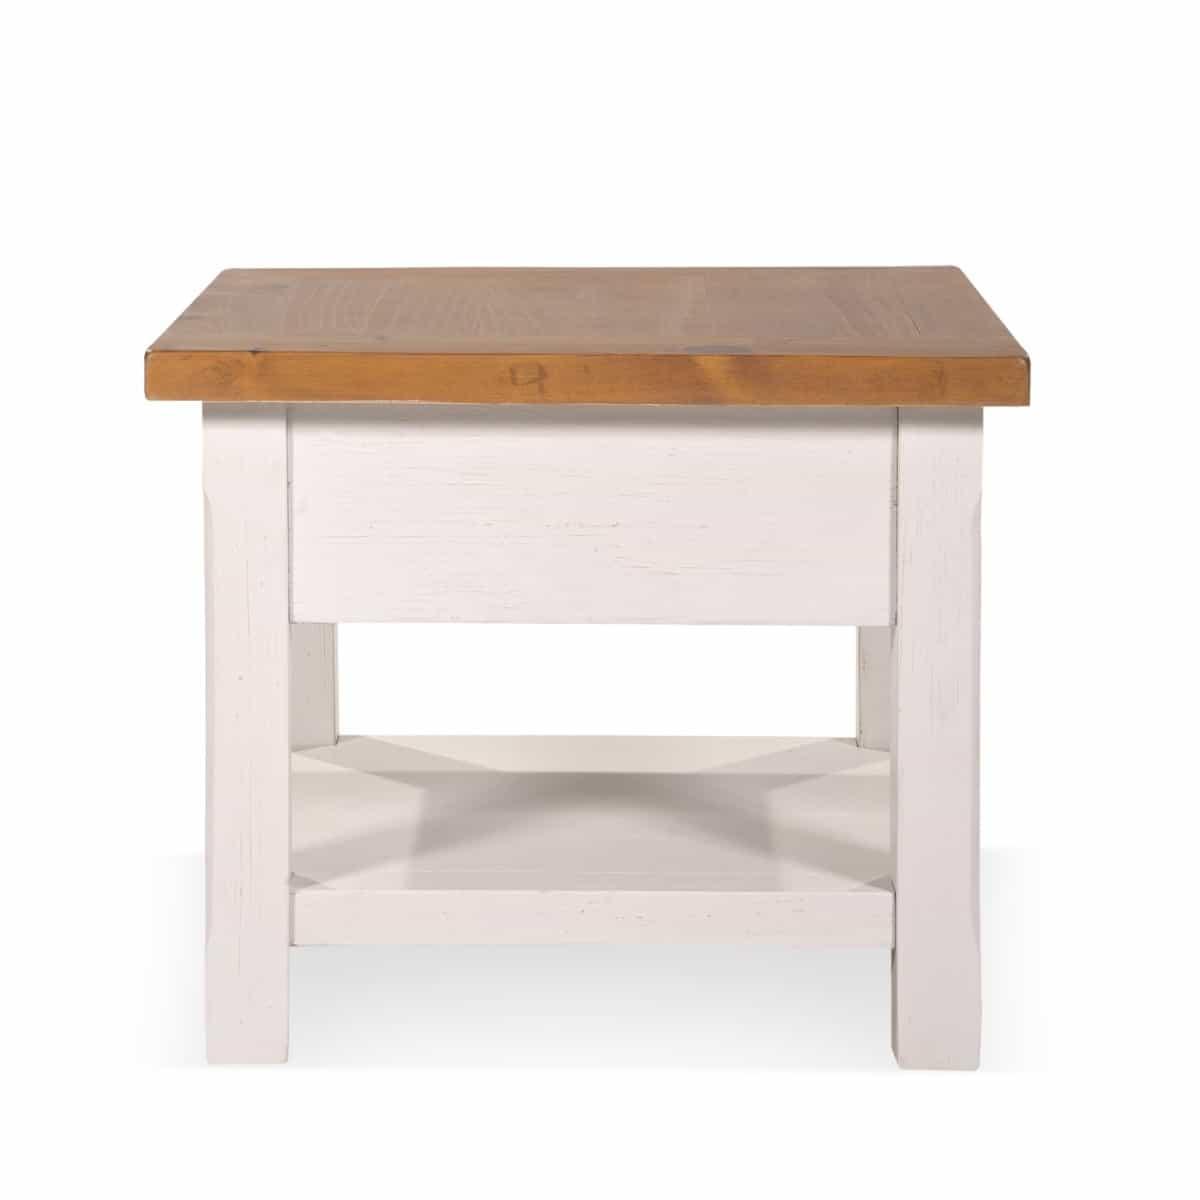 Table de chevet 1 Tiroir Bois Blanc 60x60x50cm